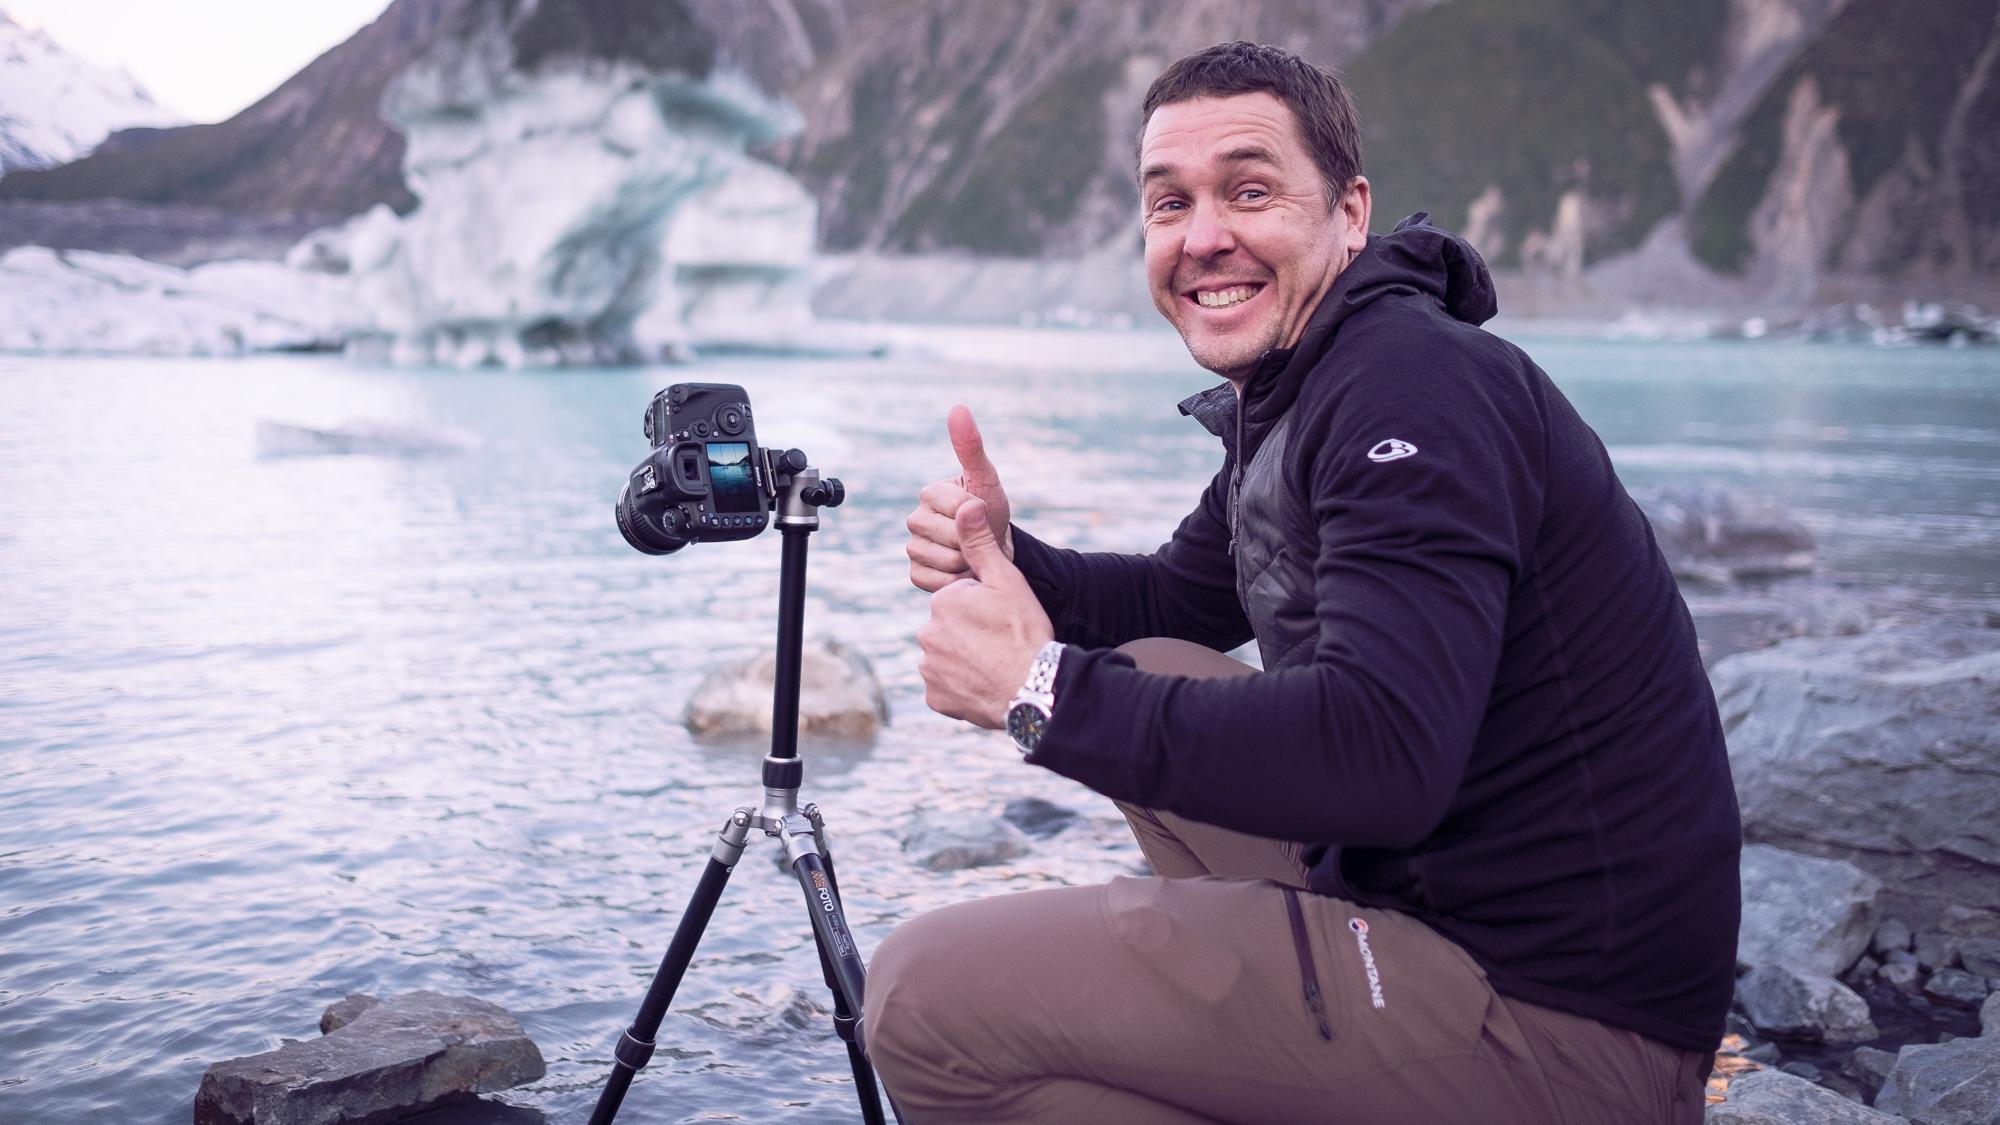 photography-workshop-newzealand-mountcook2018-43.jpg